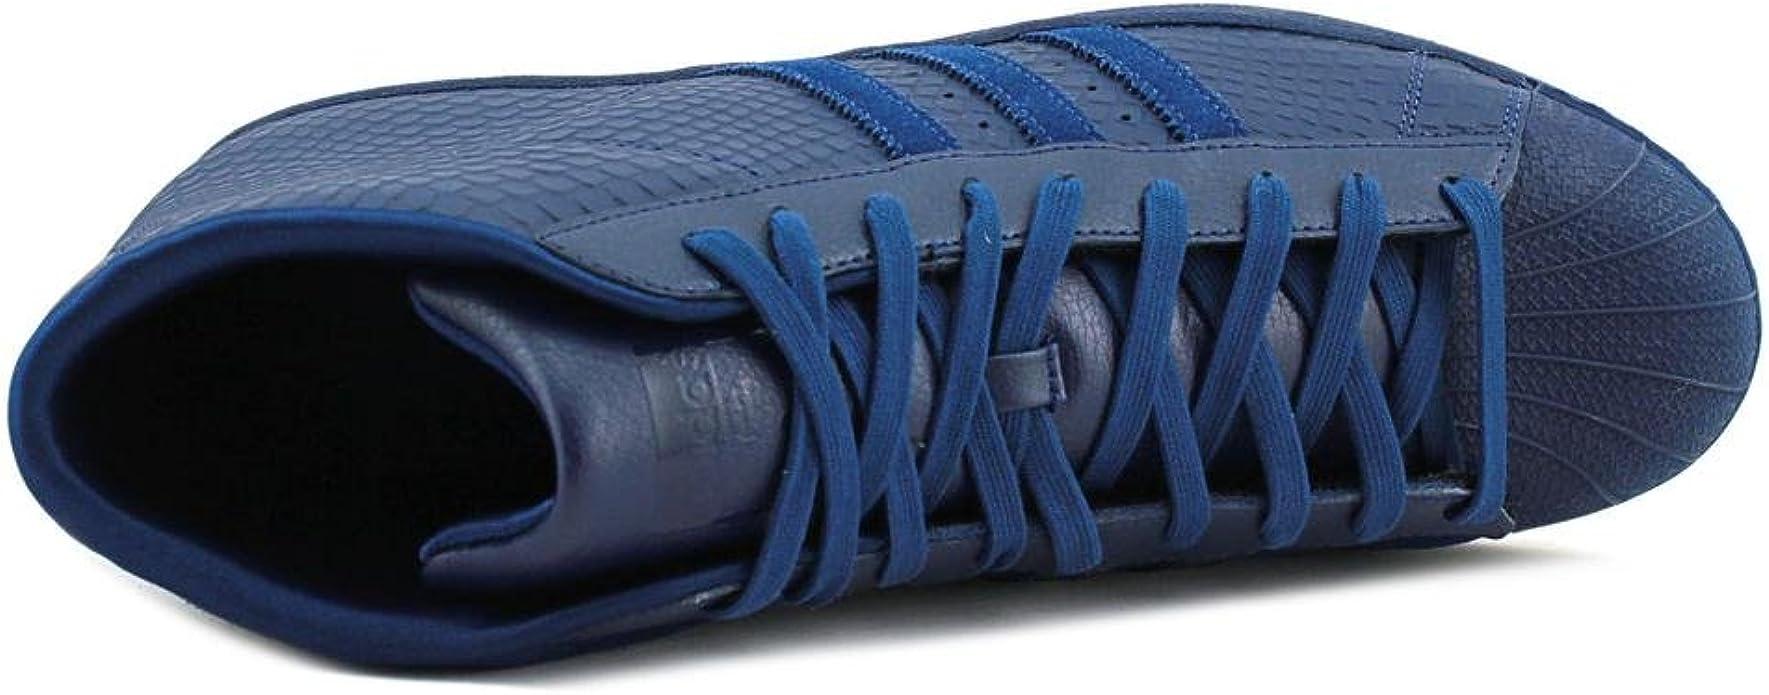 Adidas Pro Model Men US 12 Blue